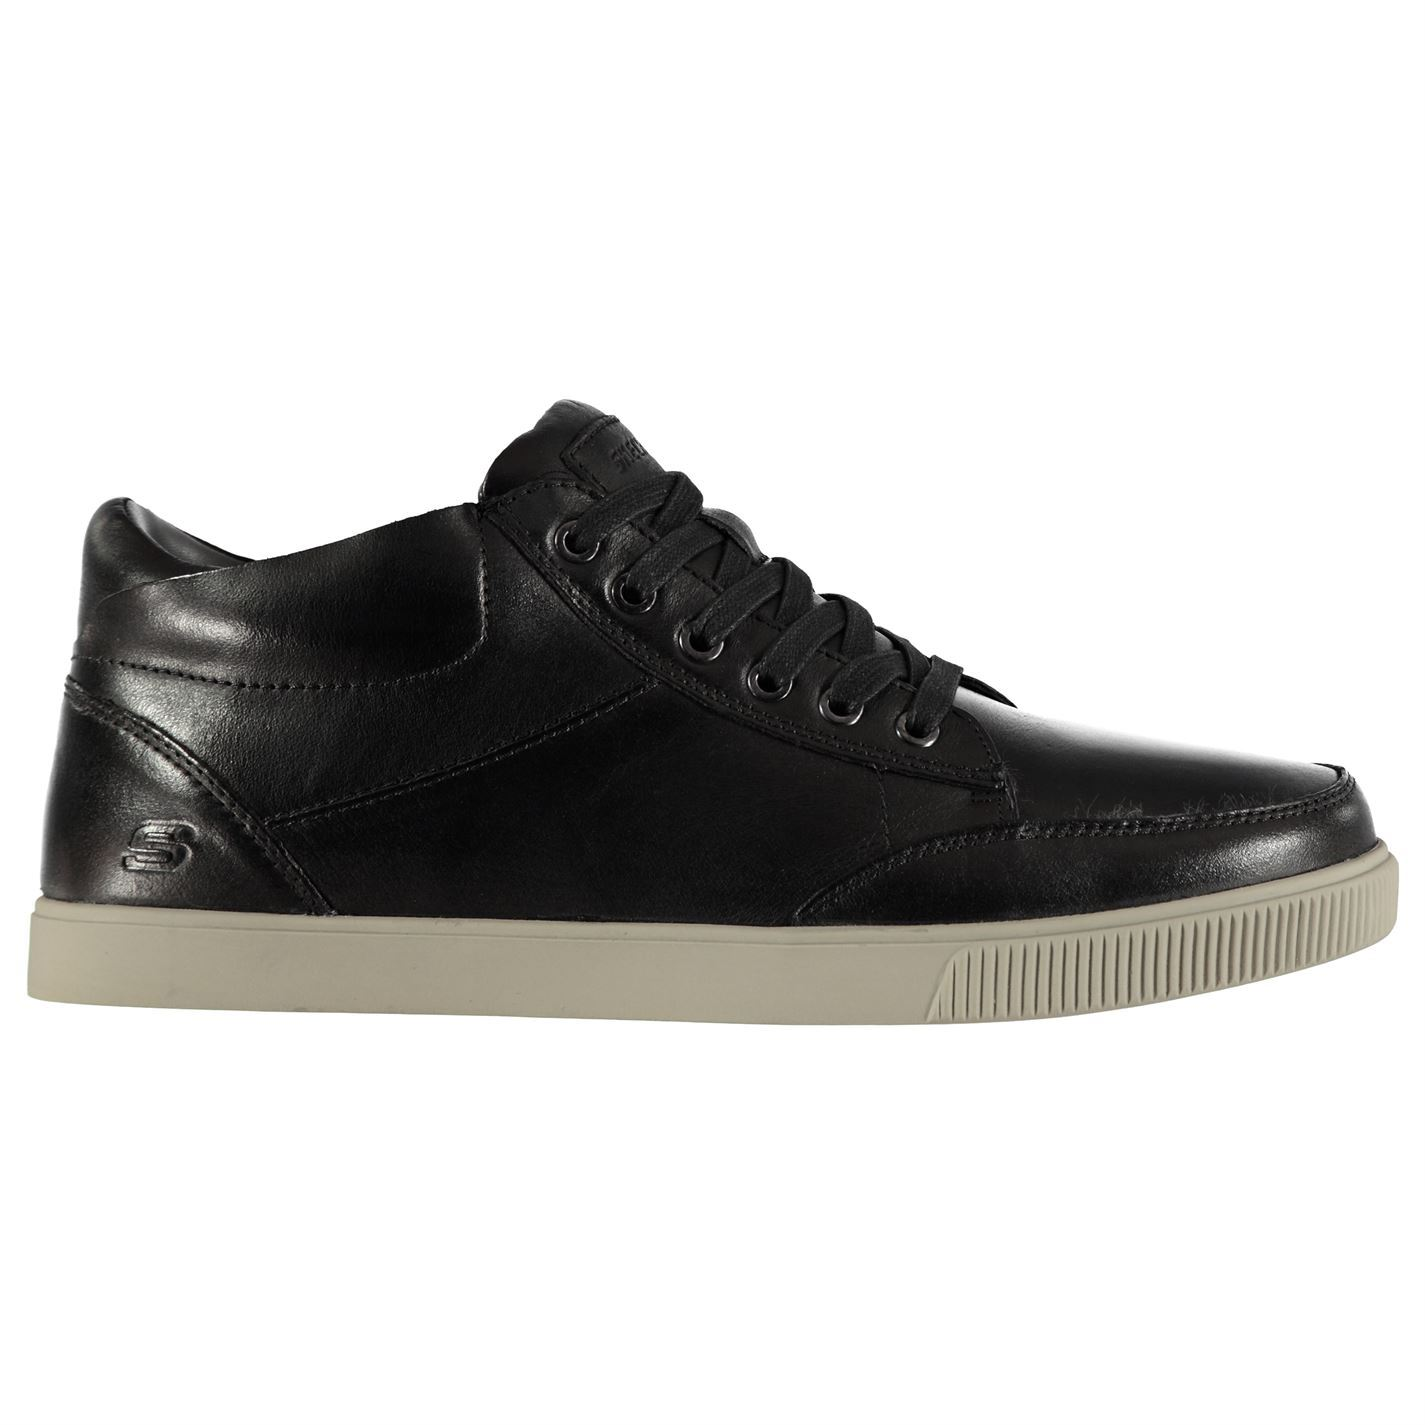 Zapatos Skechers Calzado Zapatillas Naptor Eua Volden Hombre Rwqt1S